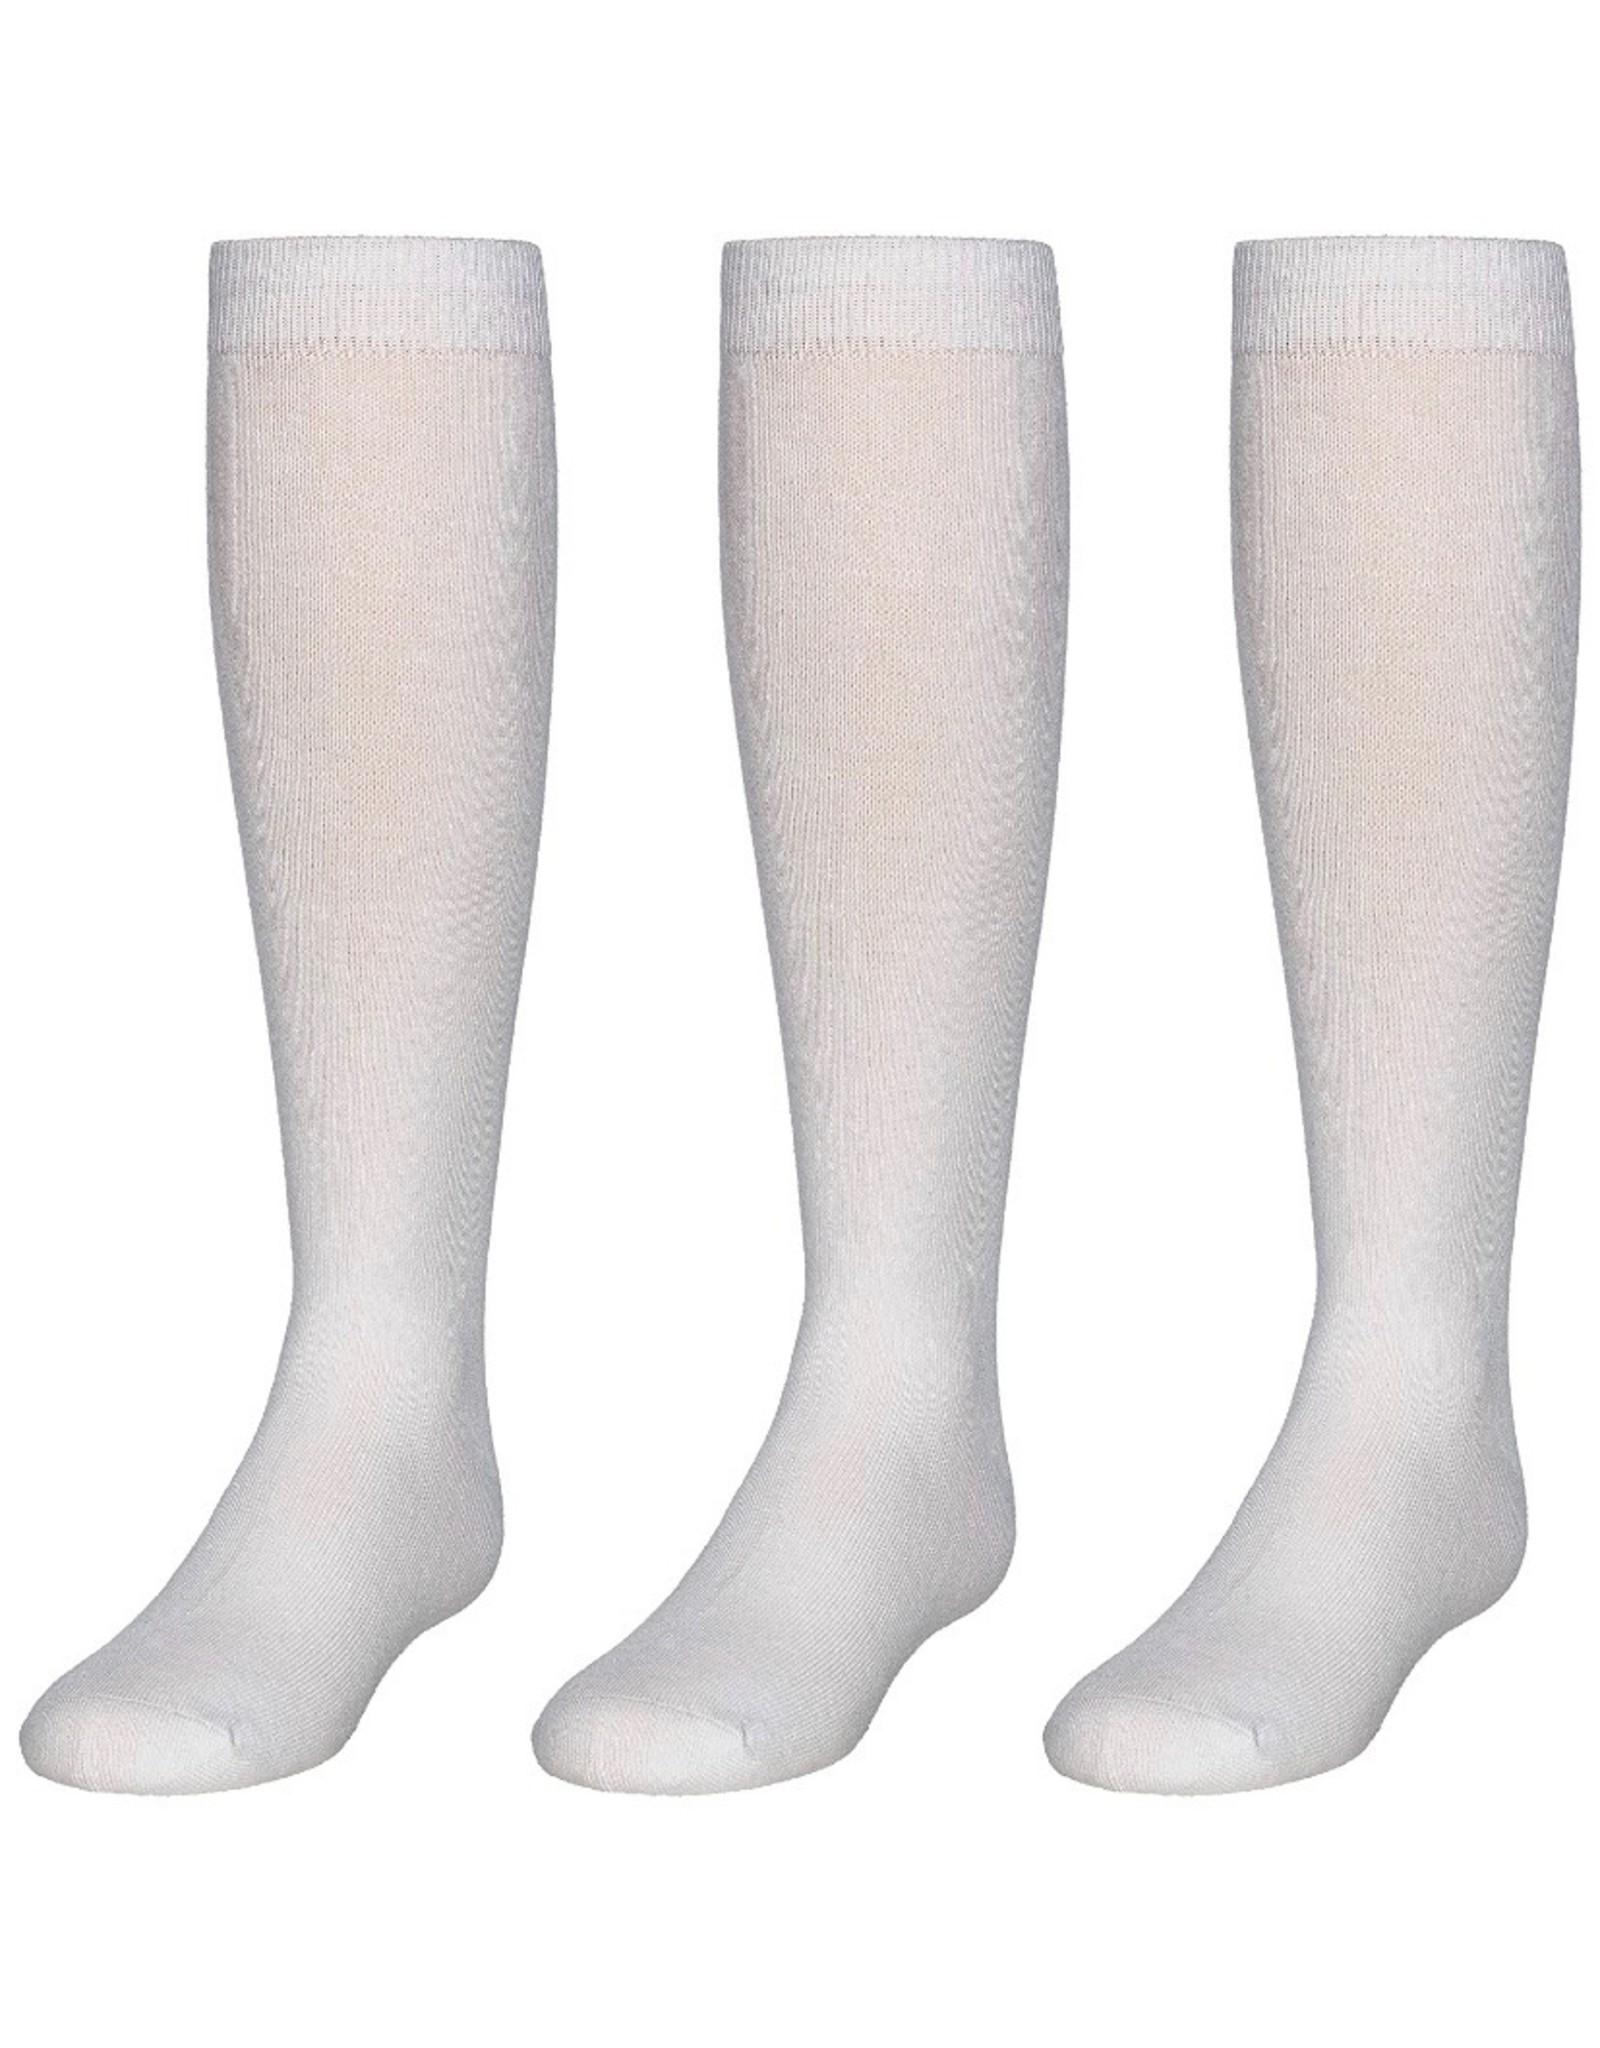 JRP JRP Flat Knit Knee Socks